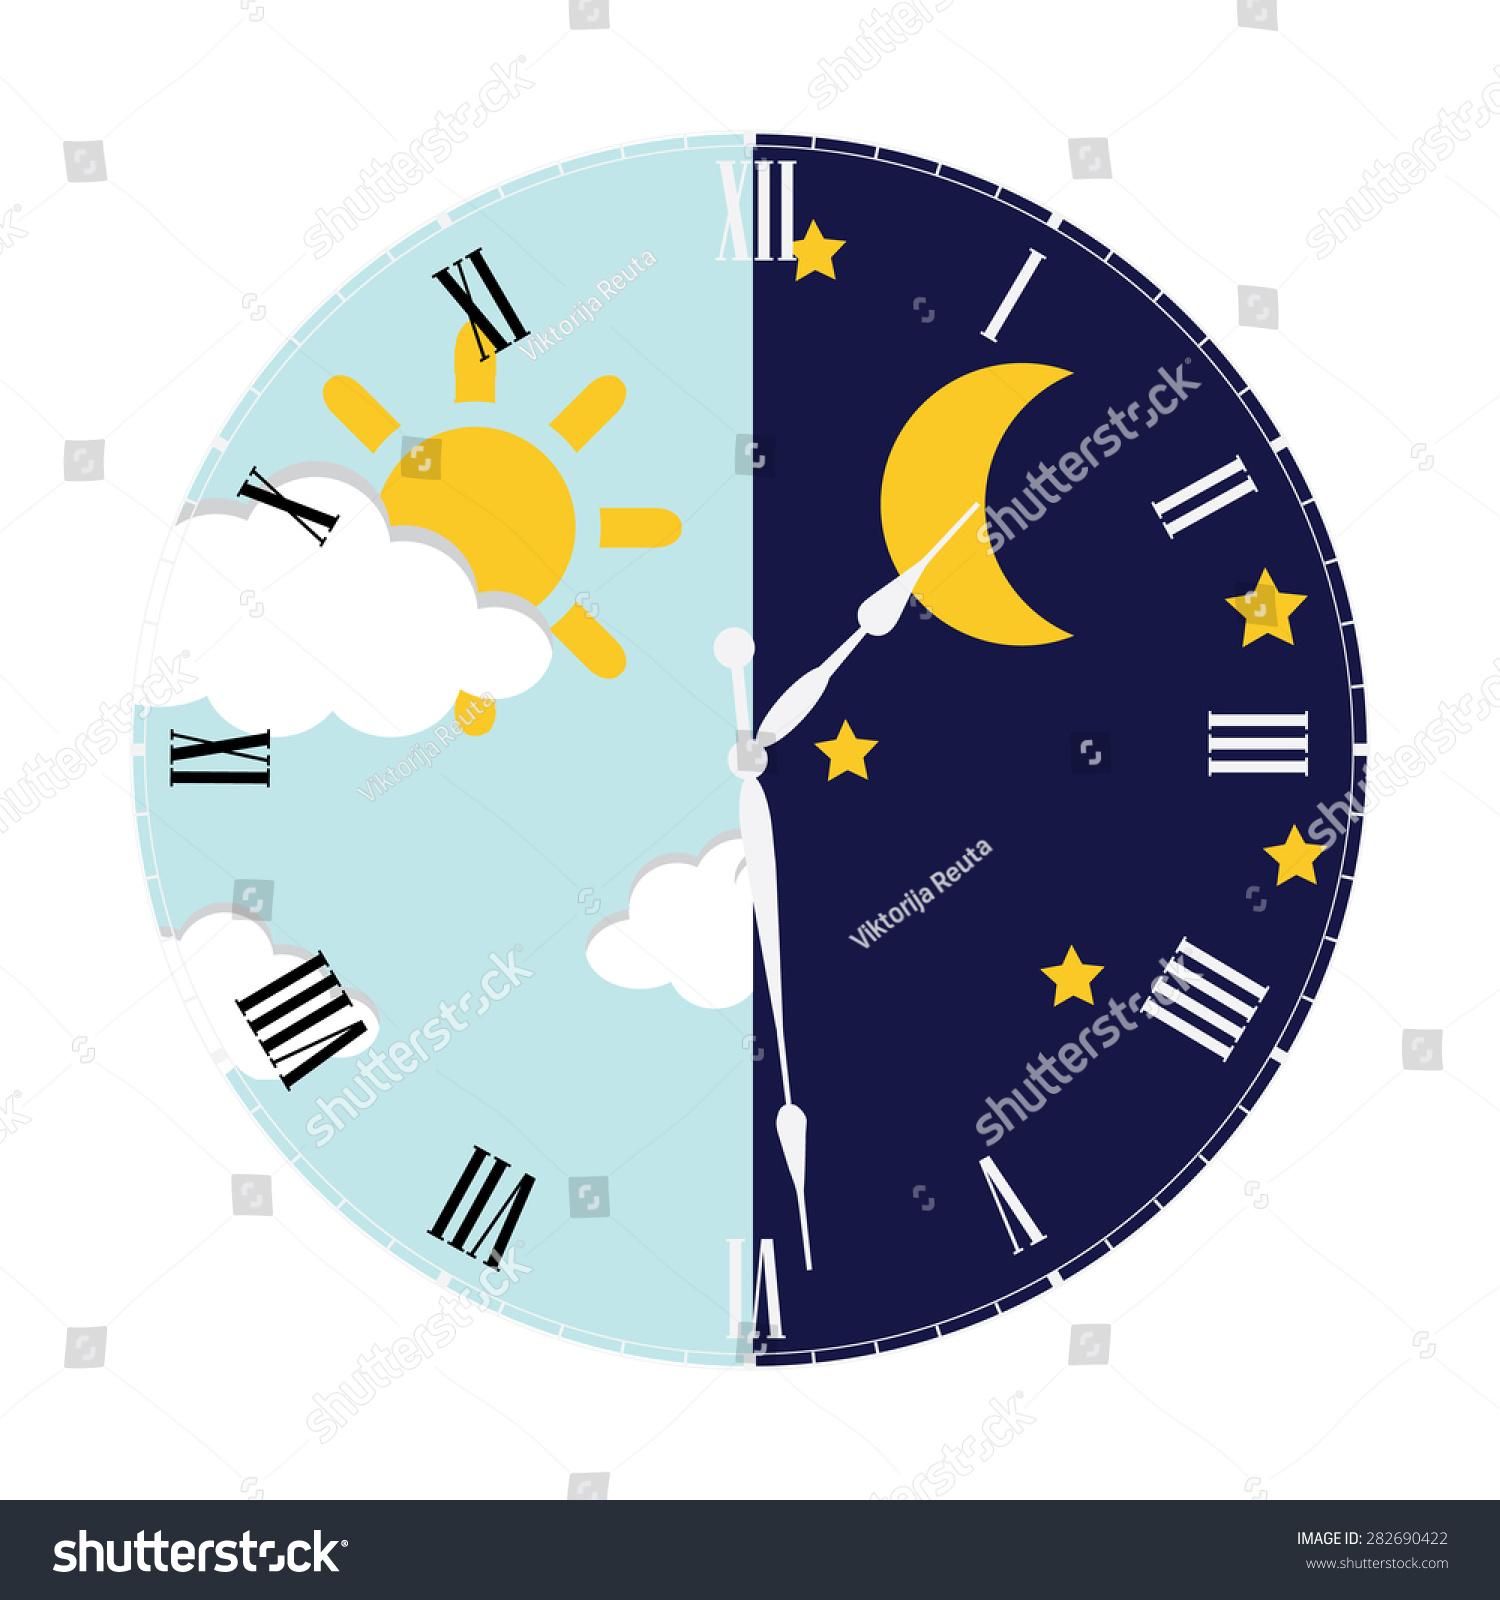 clock day night concept clock face stock vector 282690422. Black Bedroom Furniture Sets. Home Design Ideas